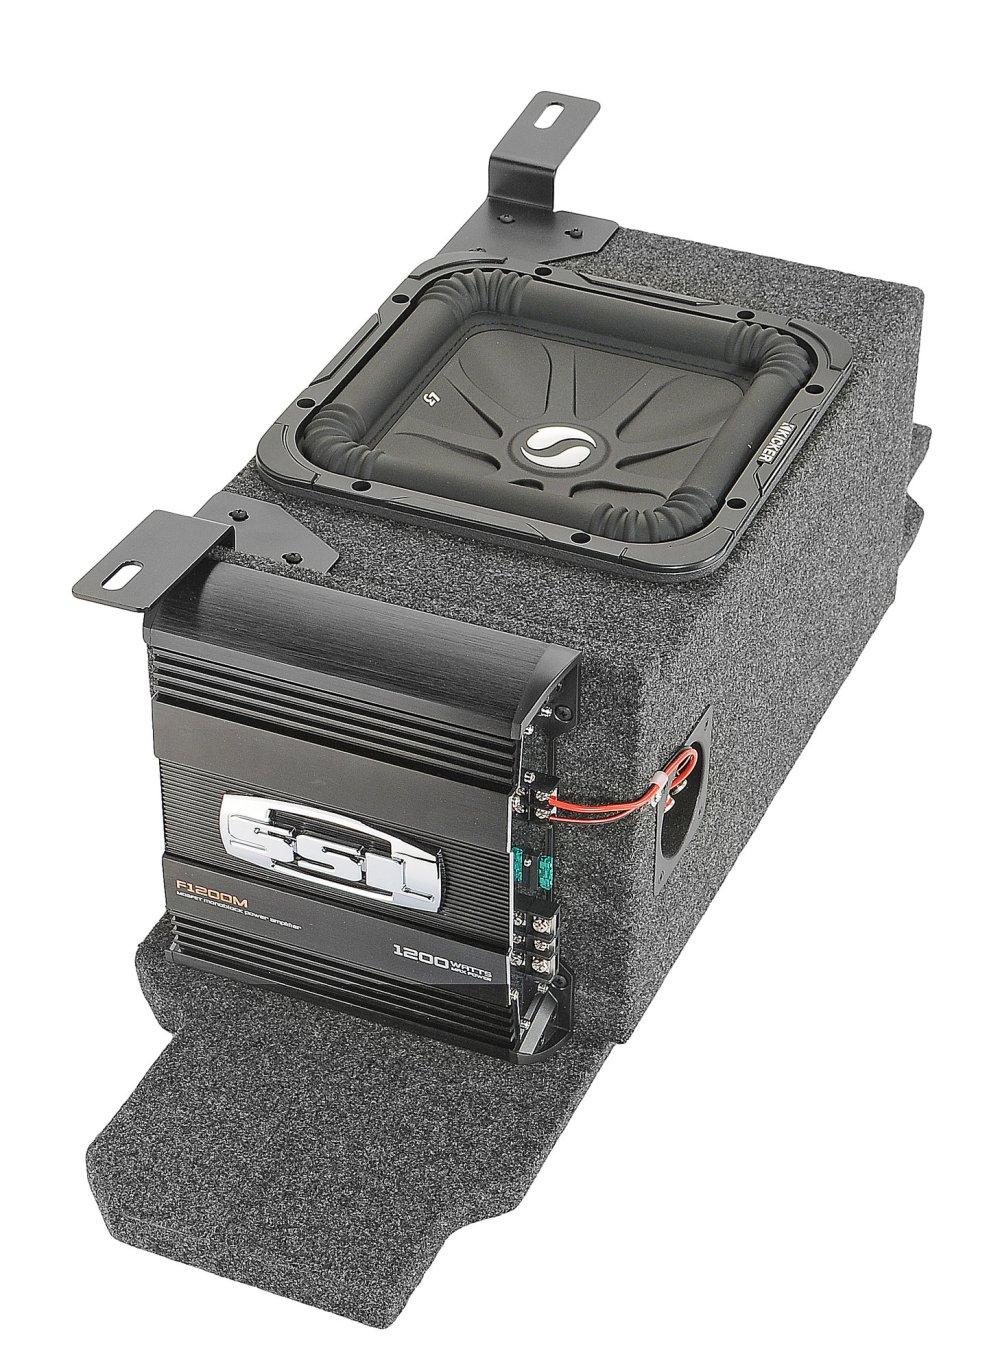 medium resolution of kicker custom rear subwoofer kit with 10 kicker solo baric l7 subwoofer for 03 06 jeep wrangler tj quadratec